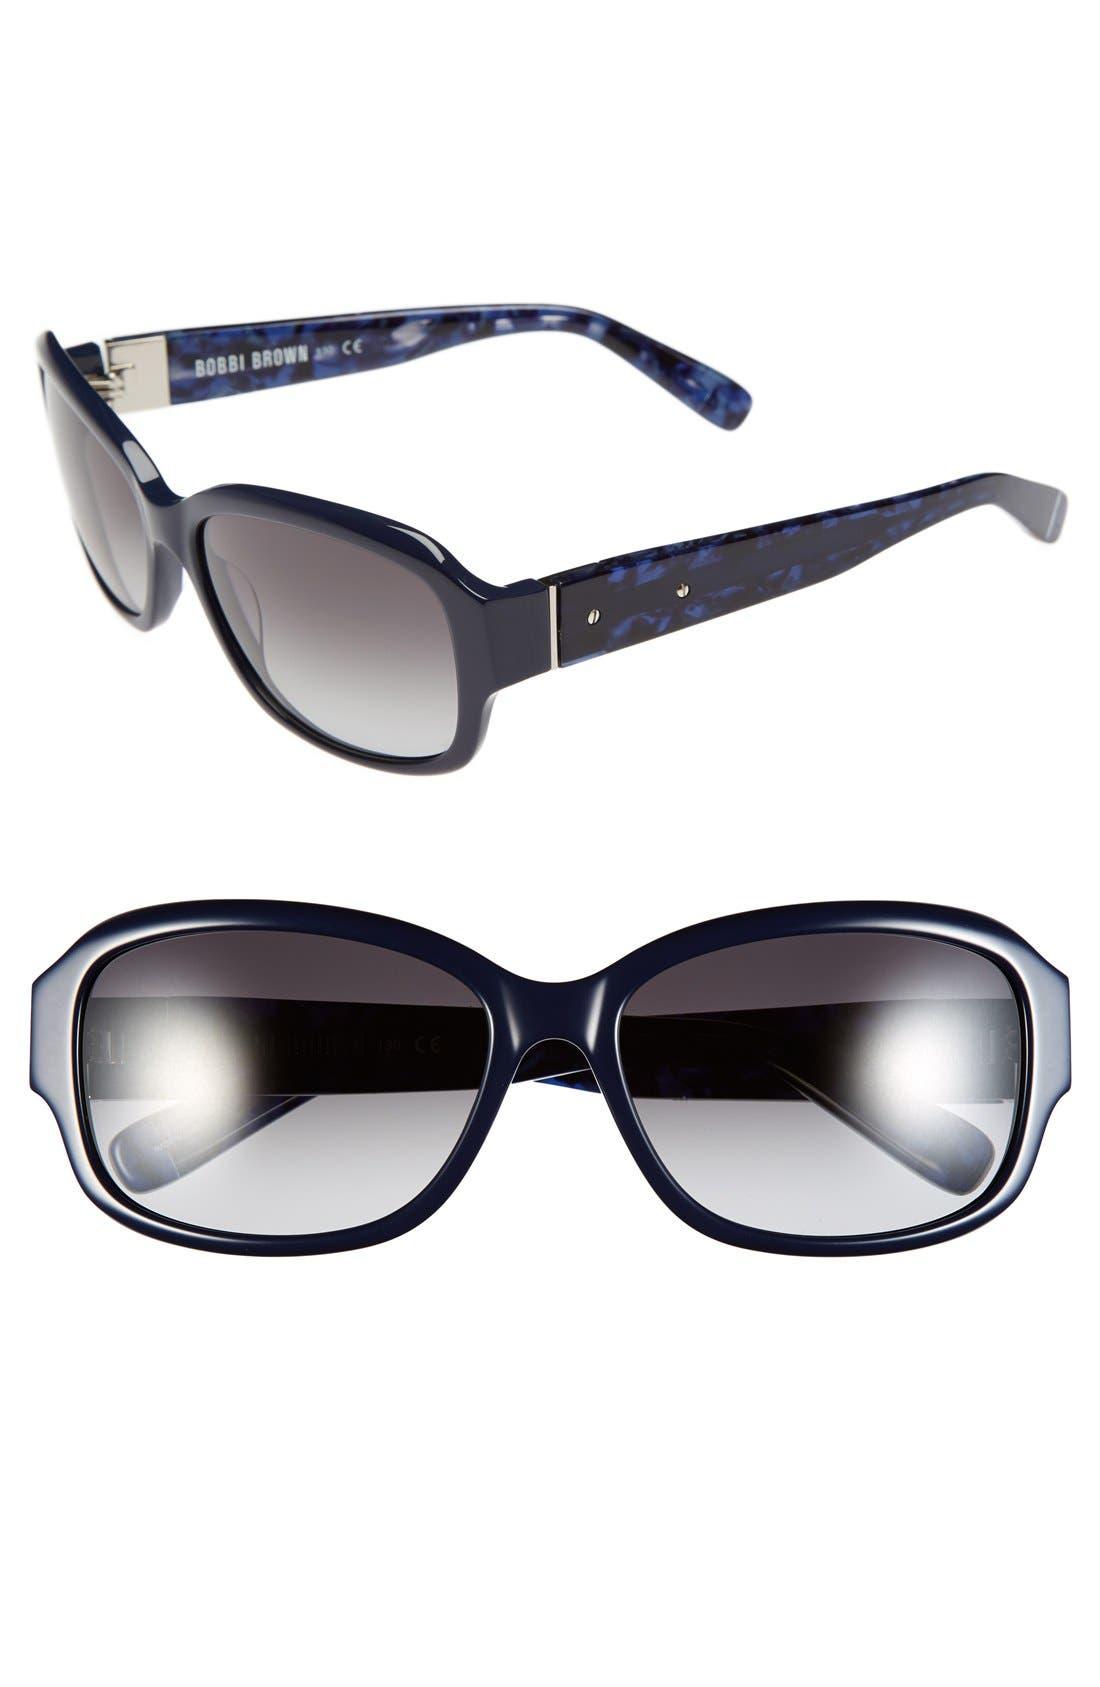 Main Image - Bobbi Brown 'The Sandra' 57mm Sunglasses